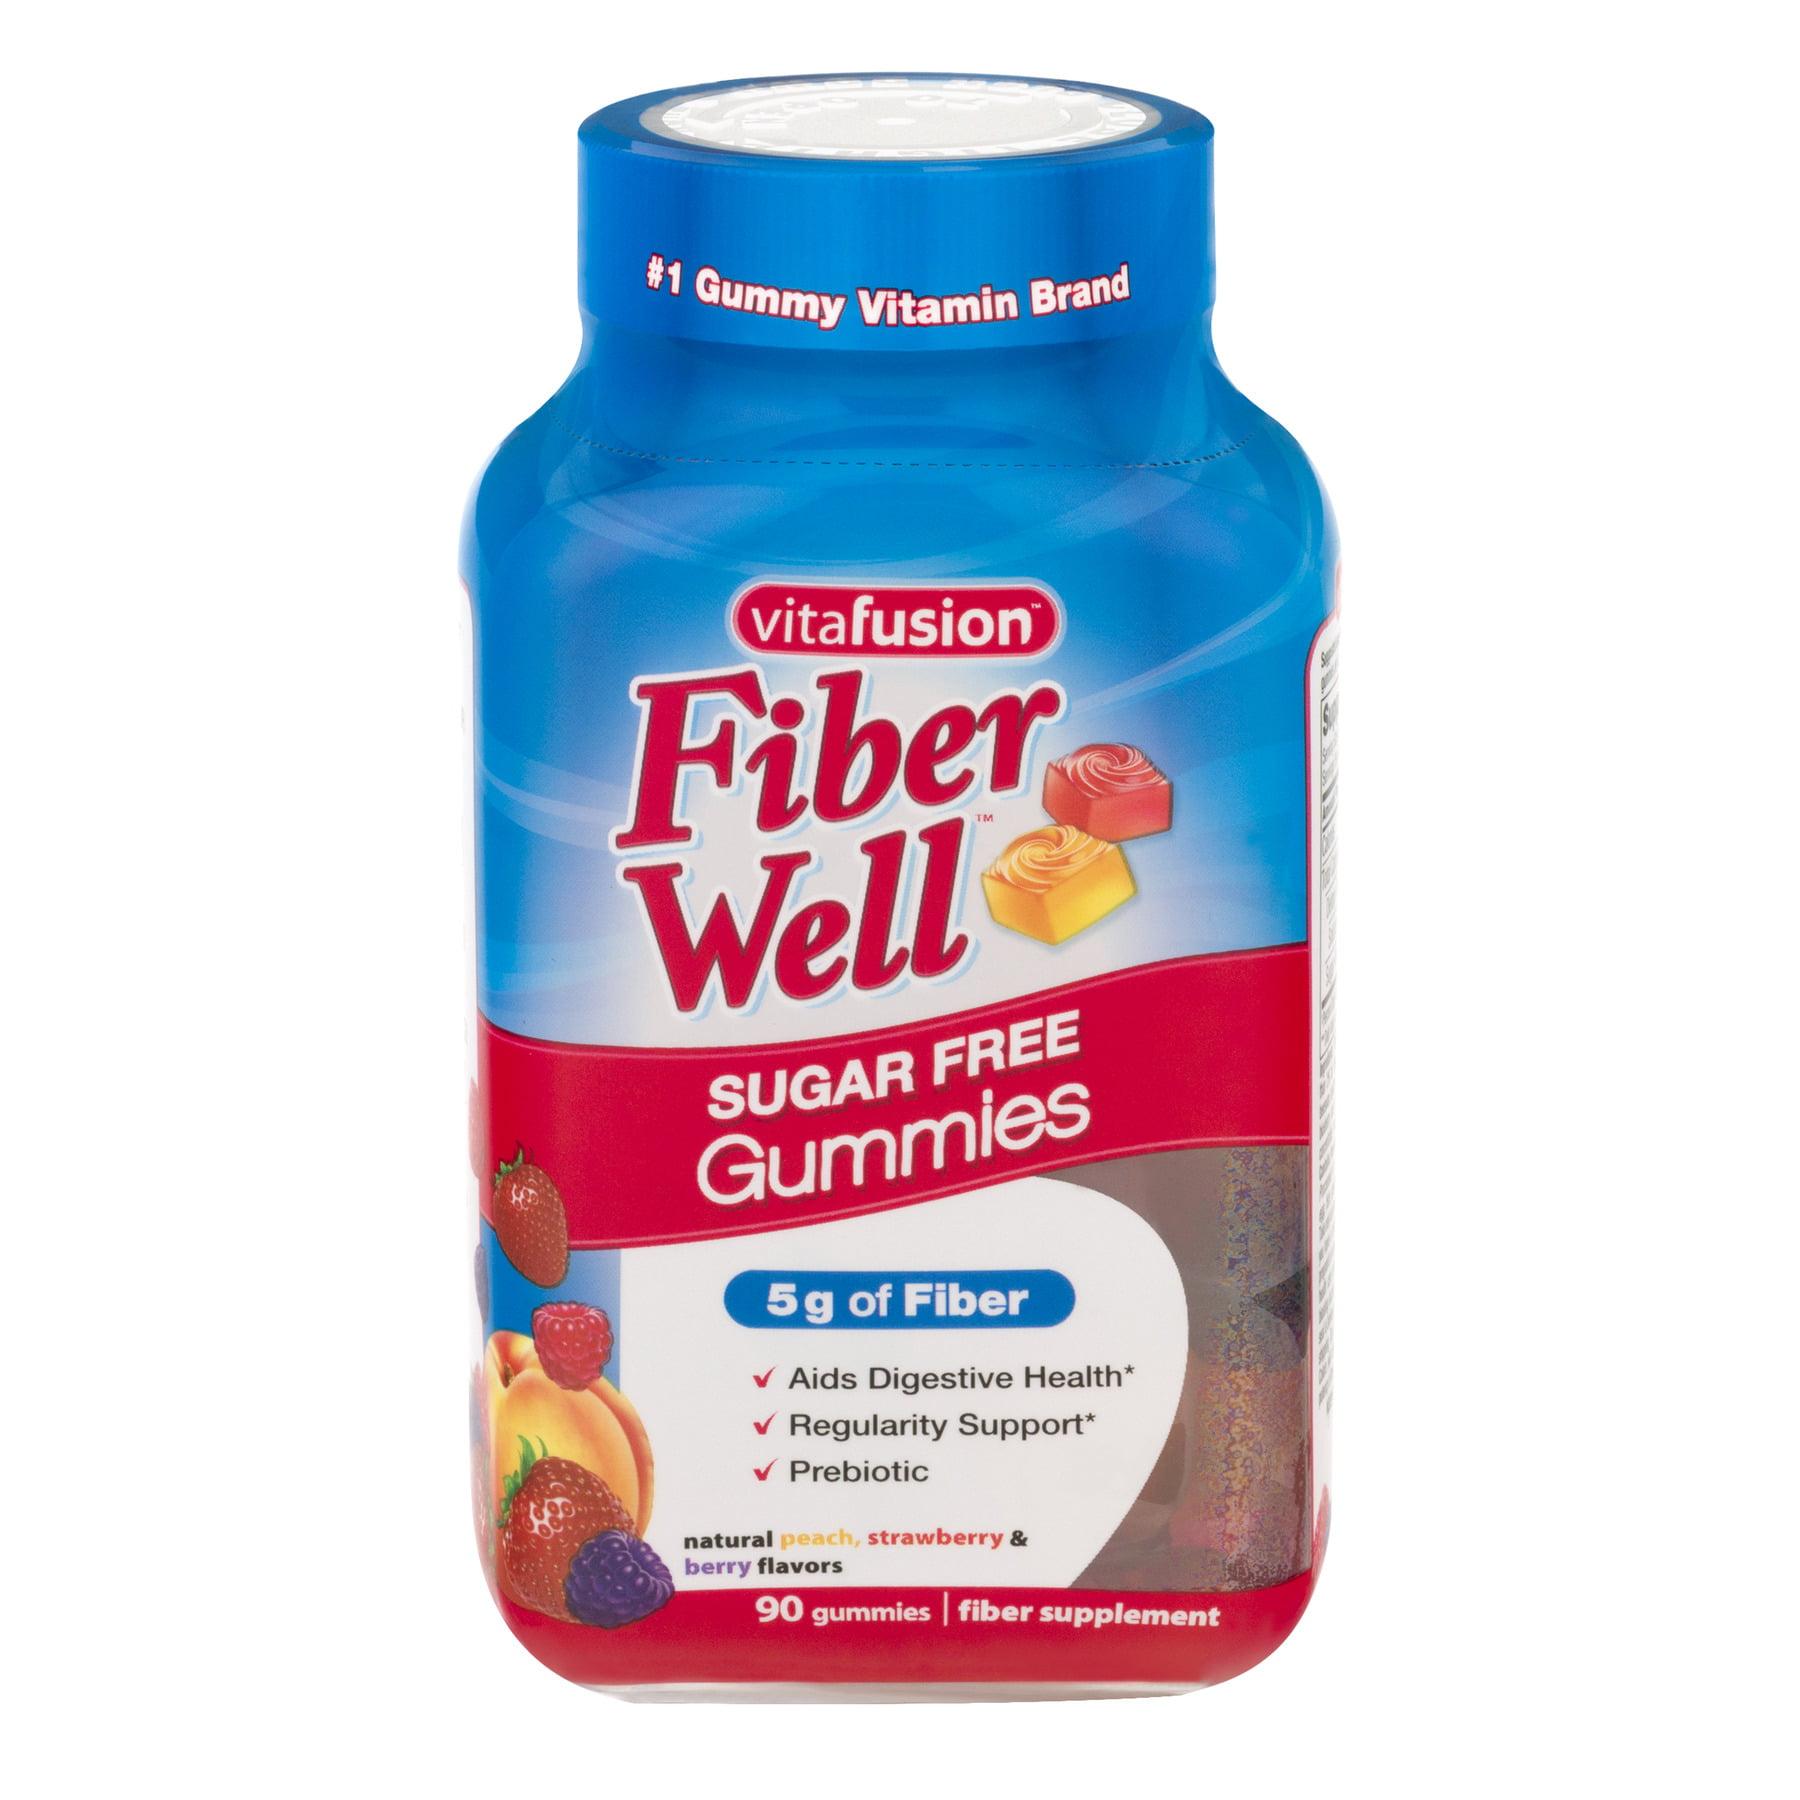 Vitafusion Fiber Well Gummies Sugar Free - 90 CT90.0 CT